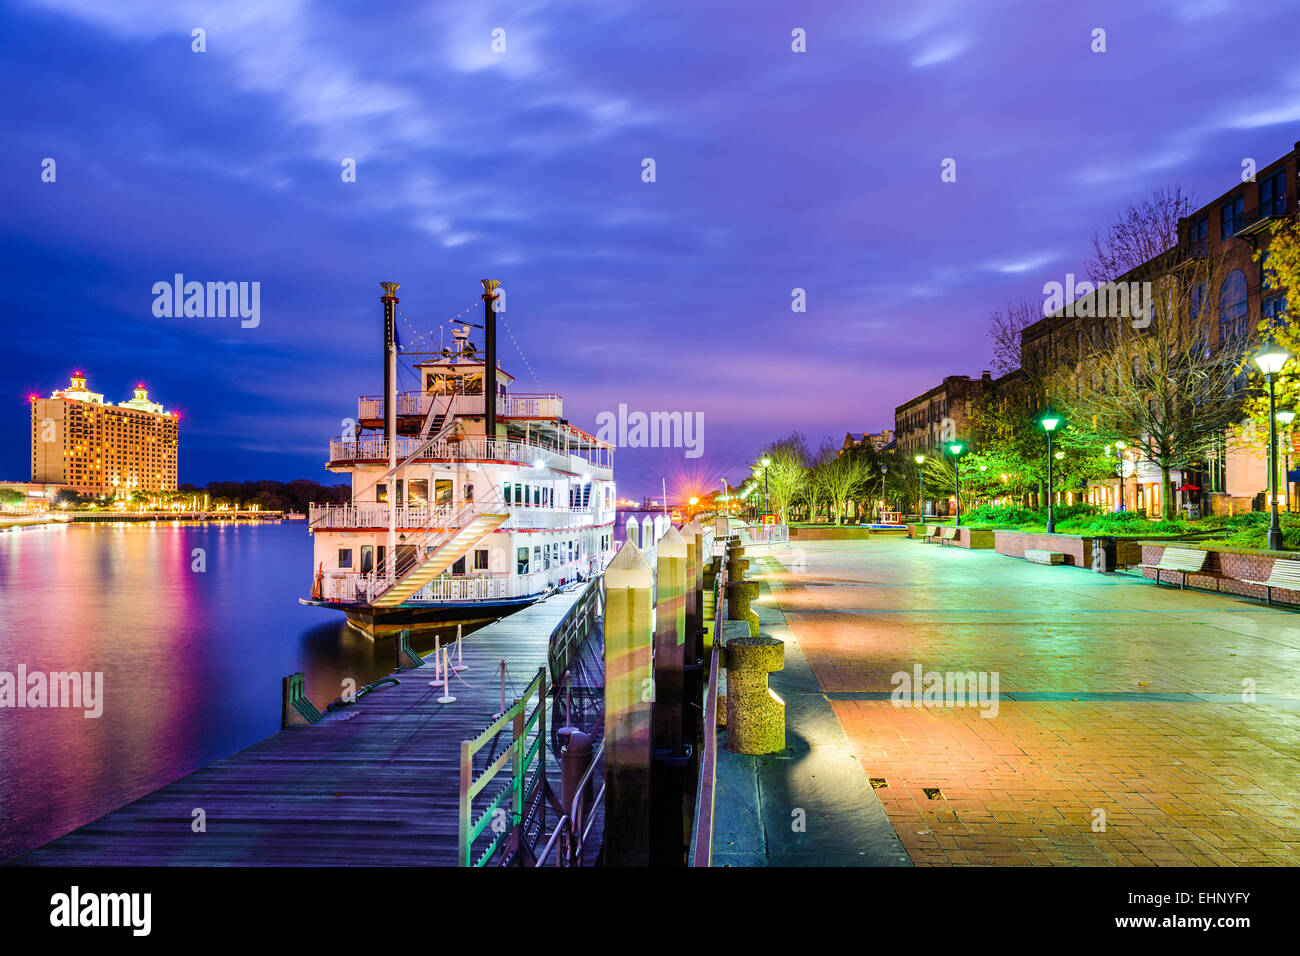 Savannah, Georgia, USA riverfront promenade at twilight. - Stock Image